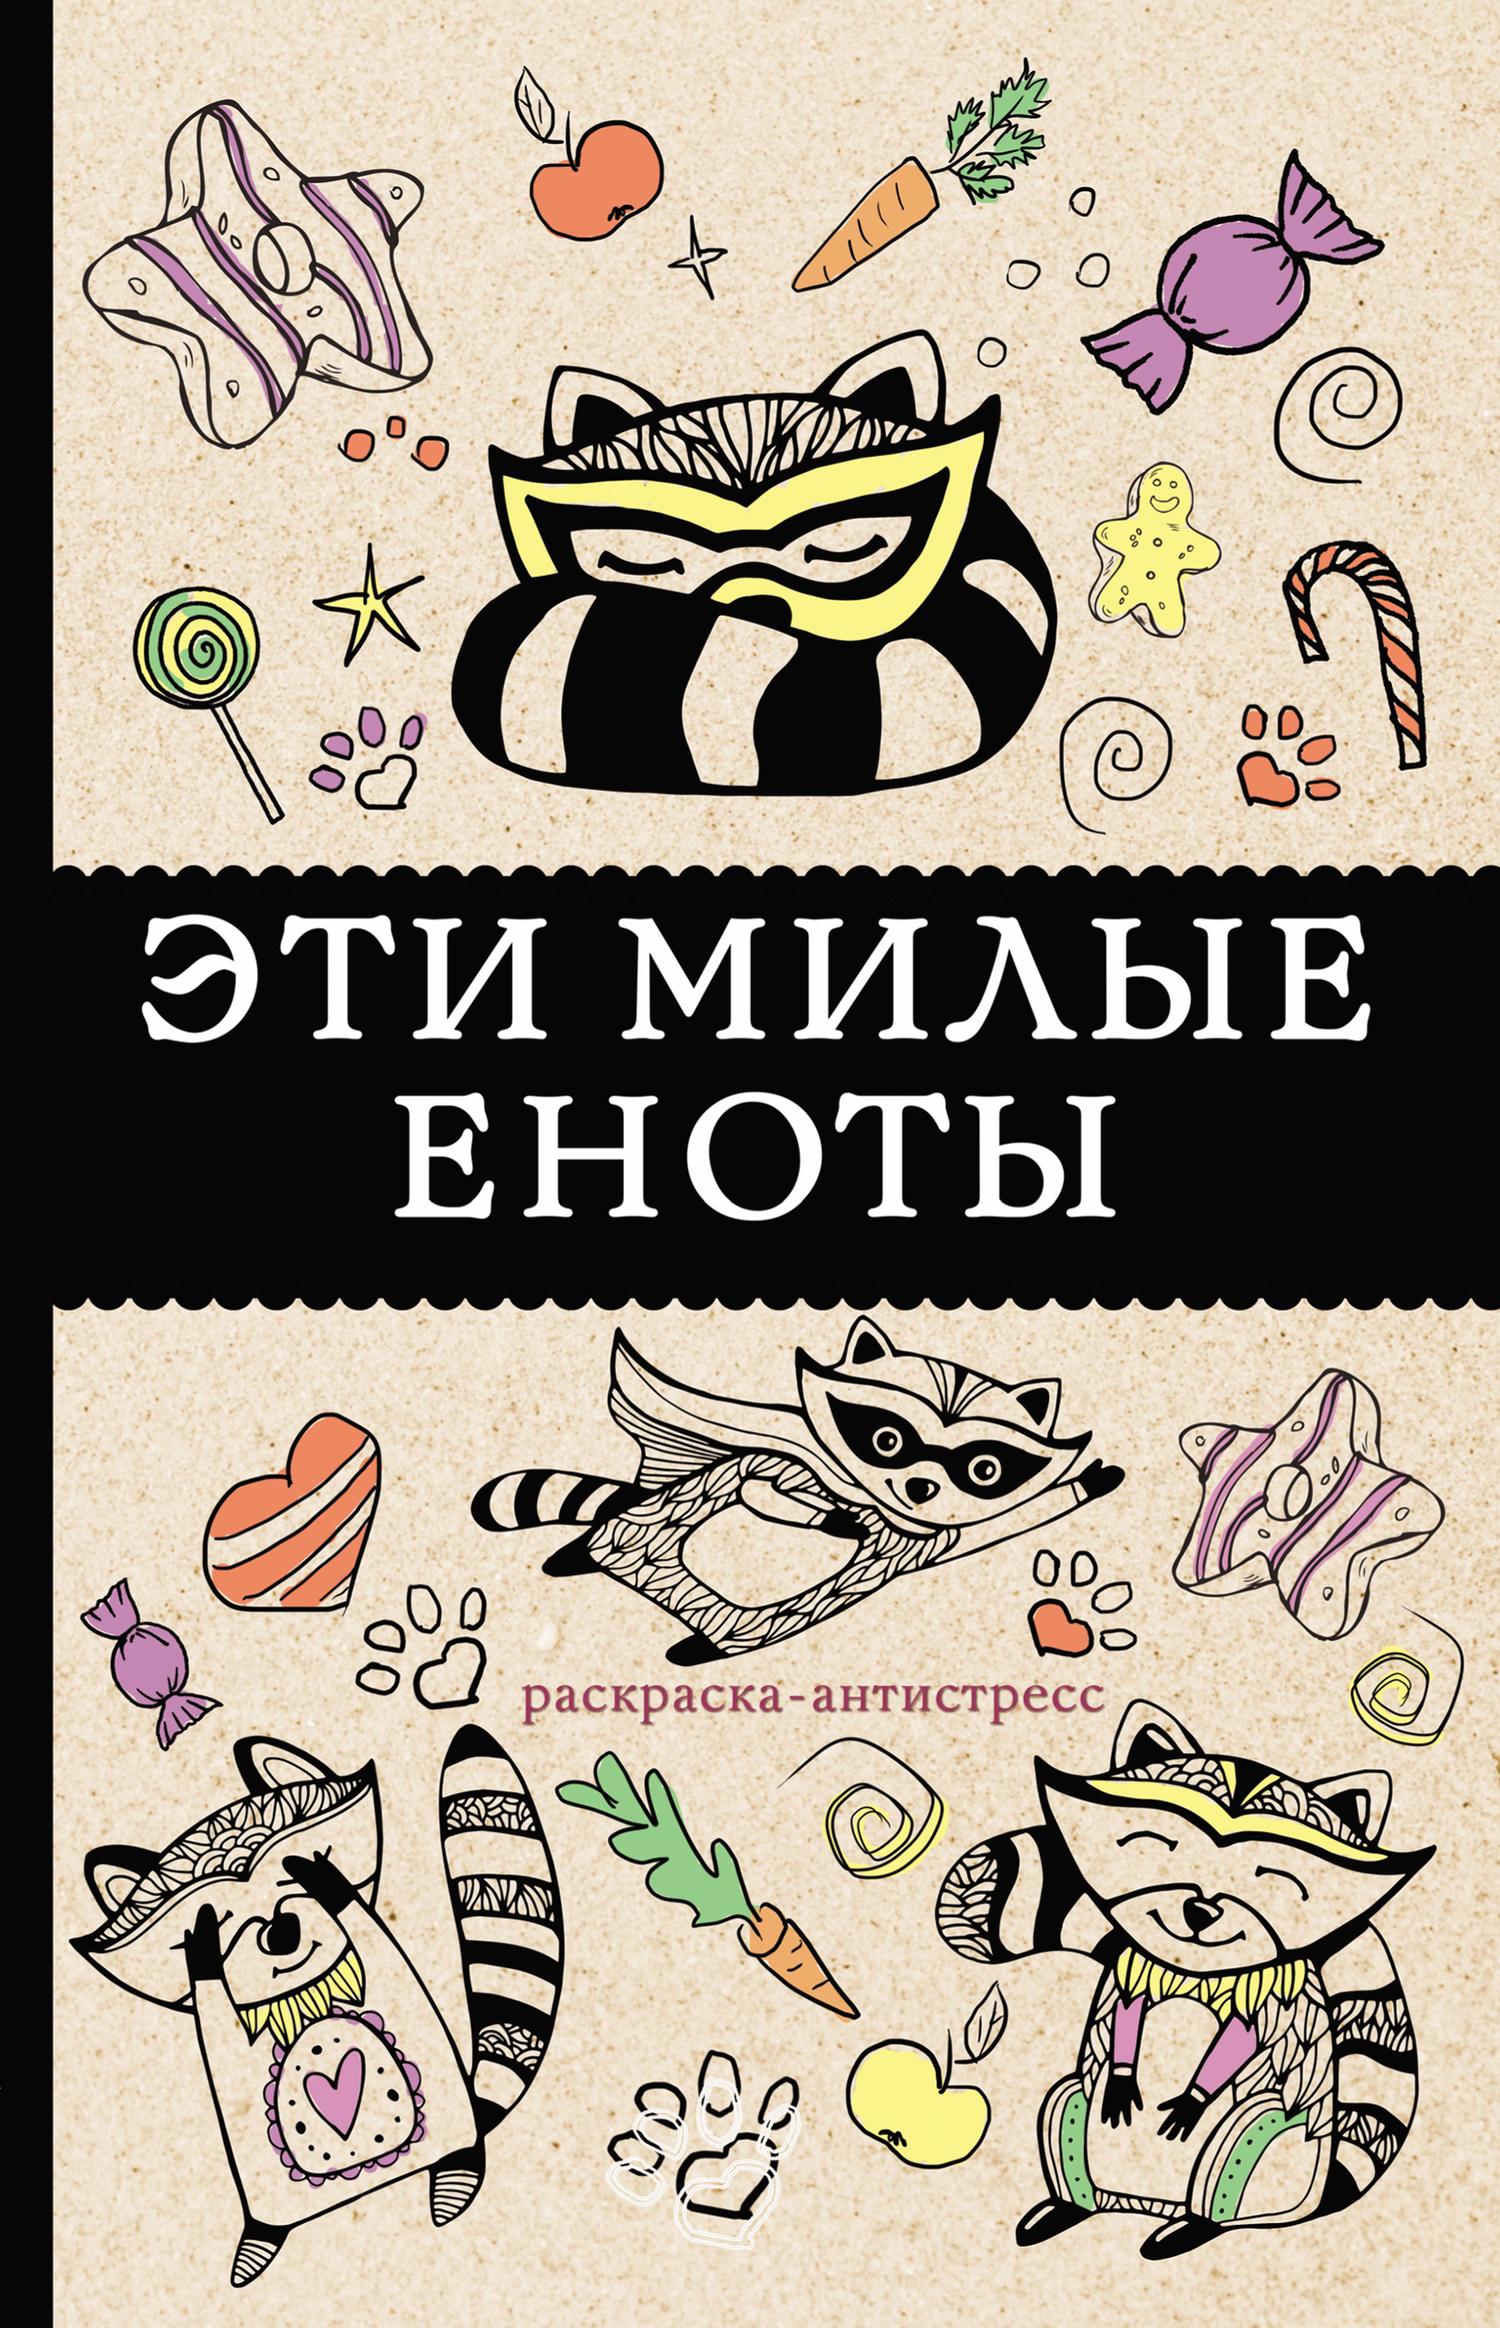 Матильда Андерсен, книга #Эти милые еноты. Раскраска ...